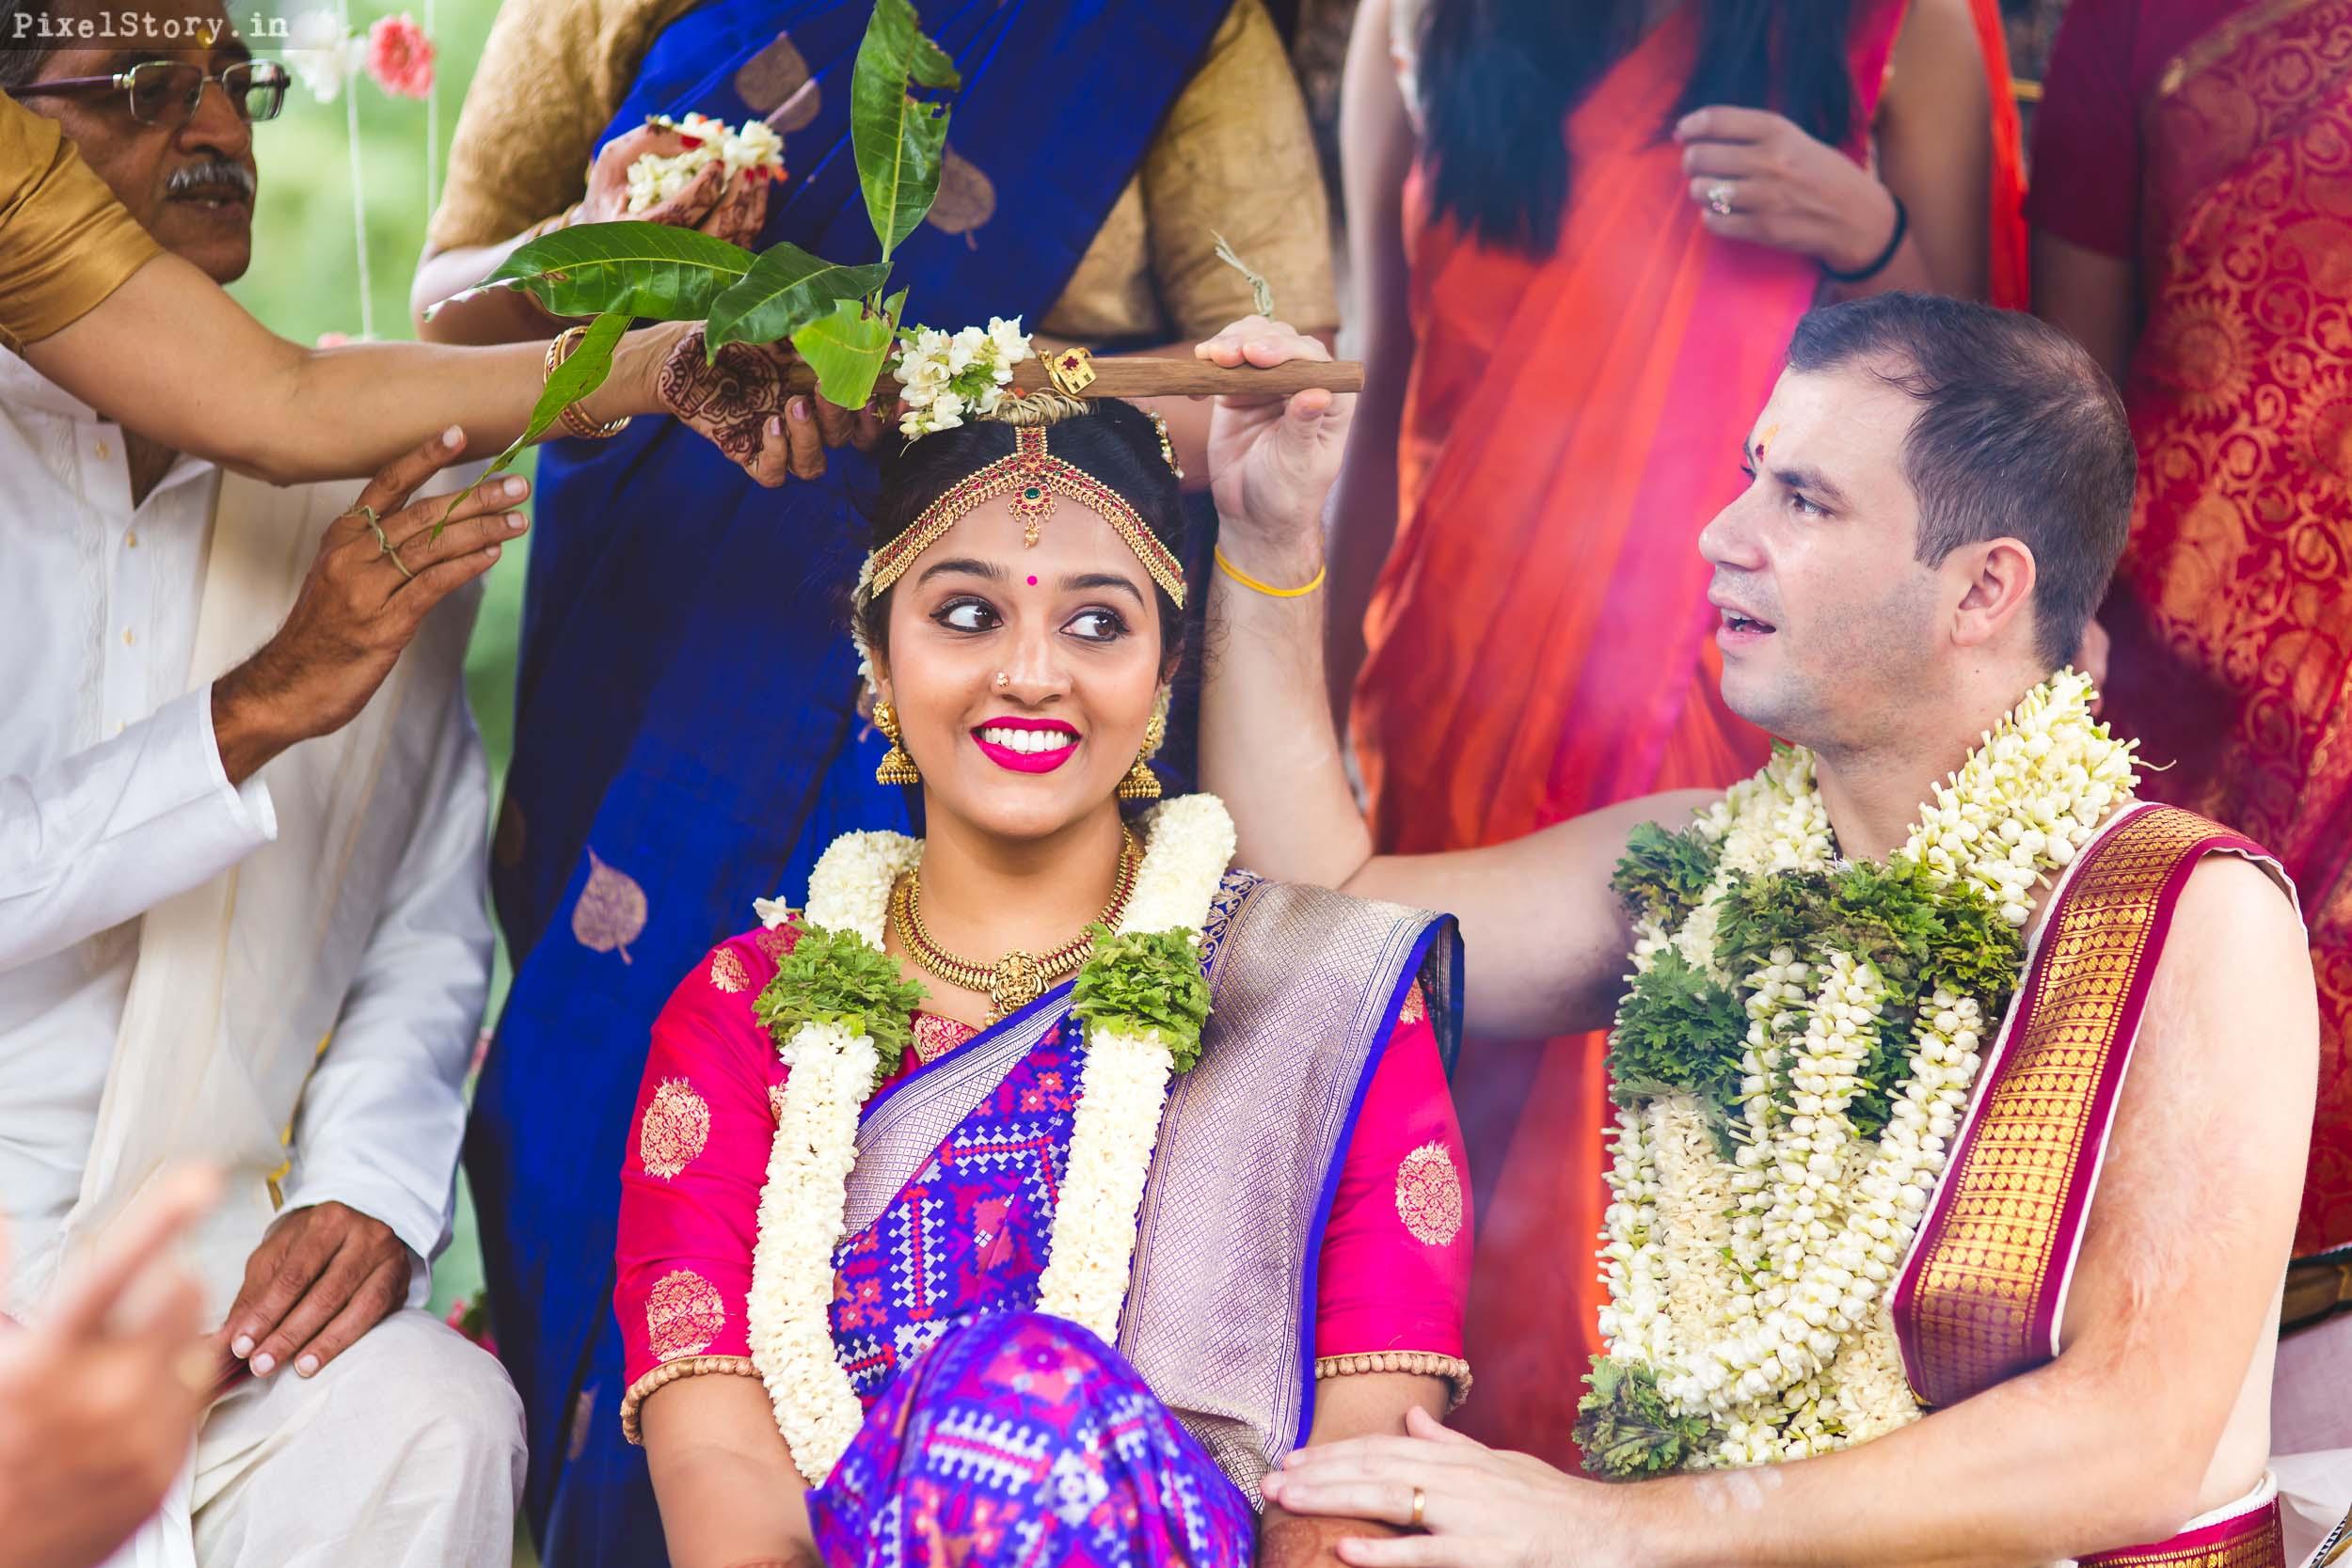 PixelStory-Jungle-Wedding-Photographer-Masinagudi-Indo-French063.jpg